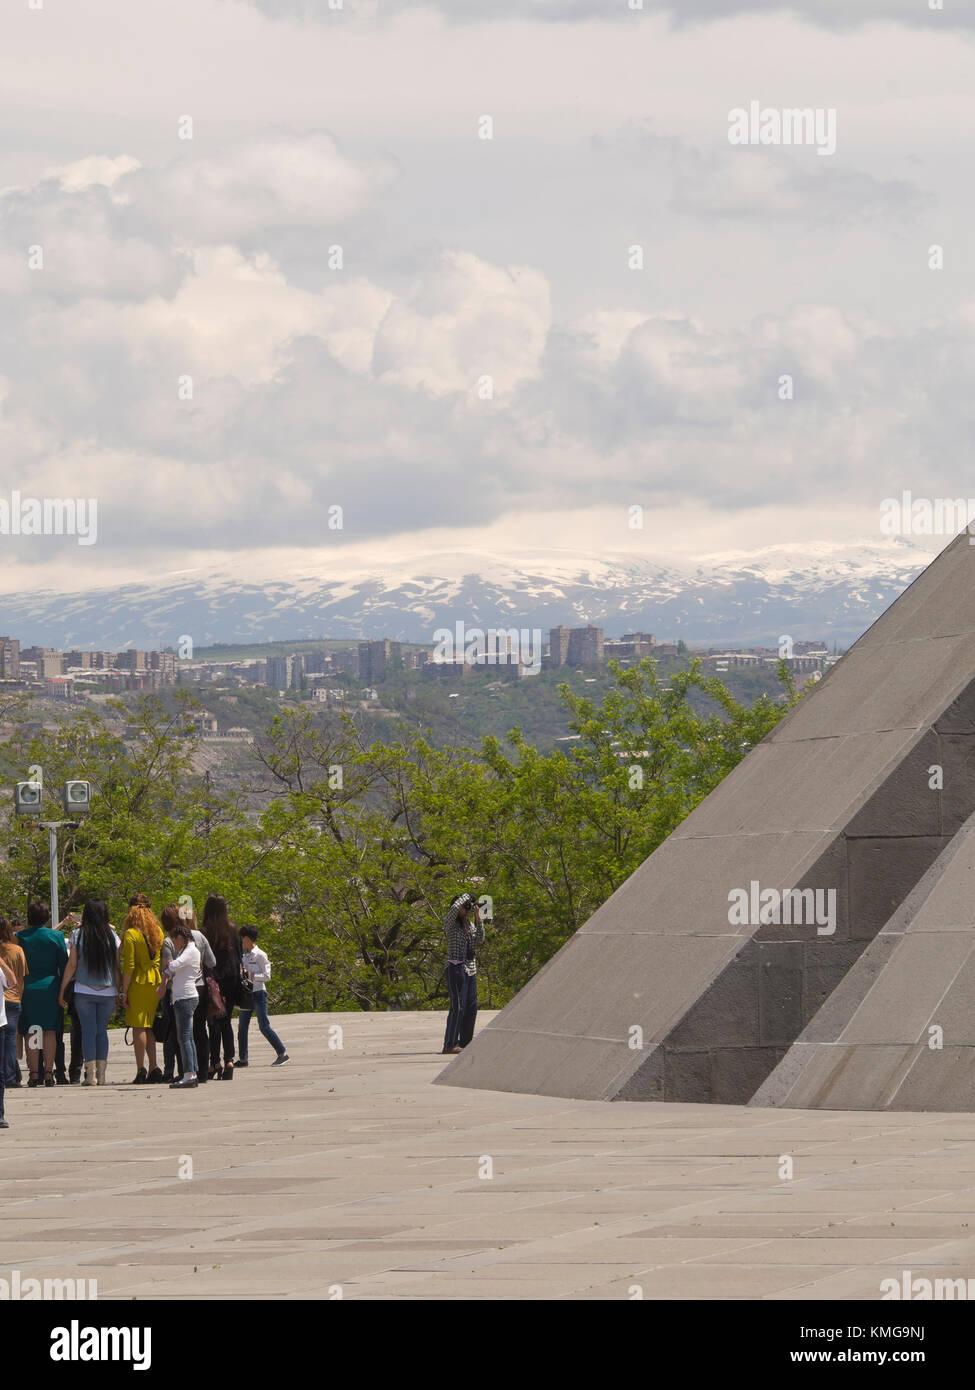 Armenian heritage, the genocide memorial and museum, Tsitsernakaberd,on a hilltop n Yerevan Armenia - Stock Image